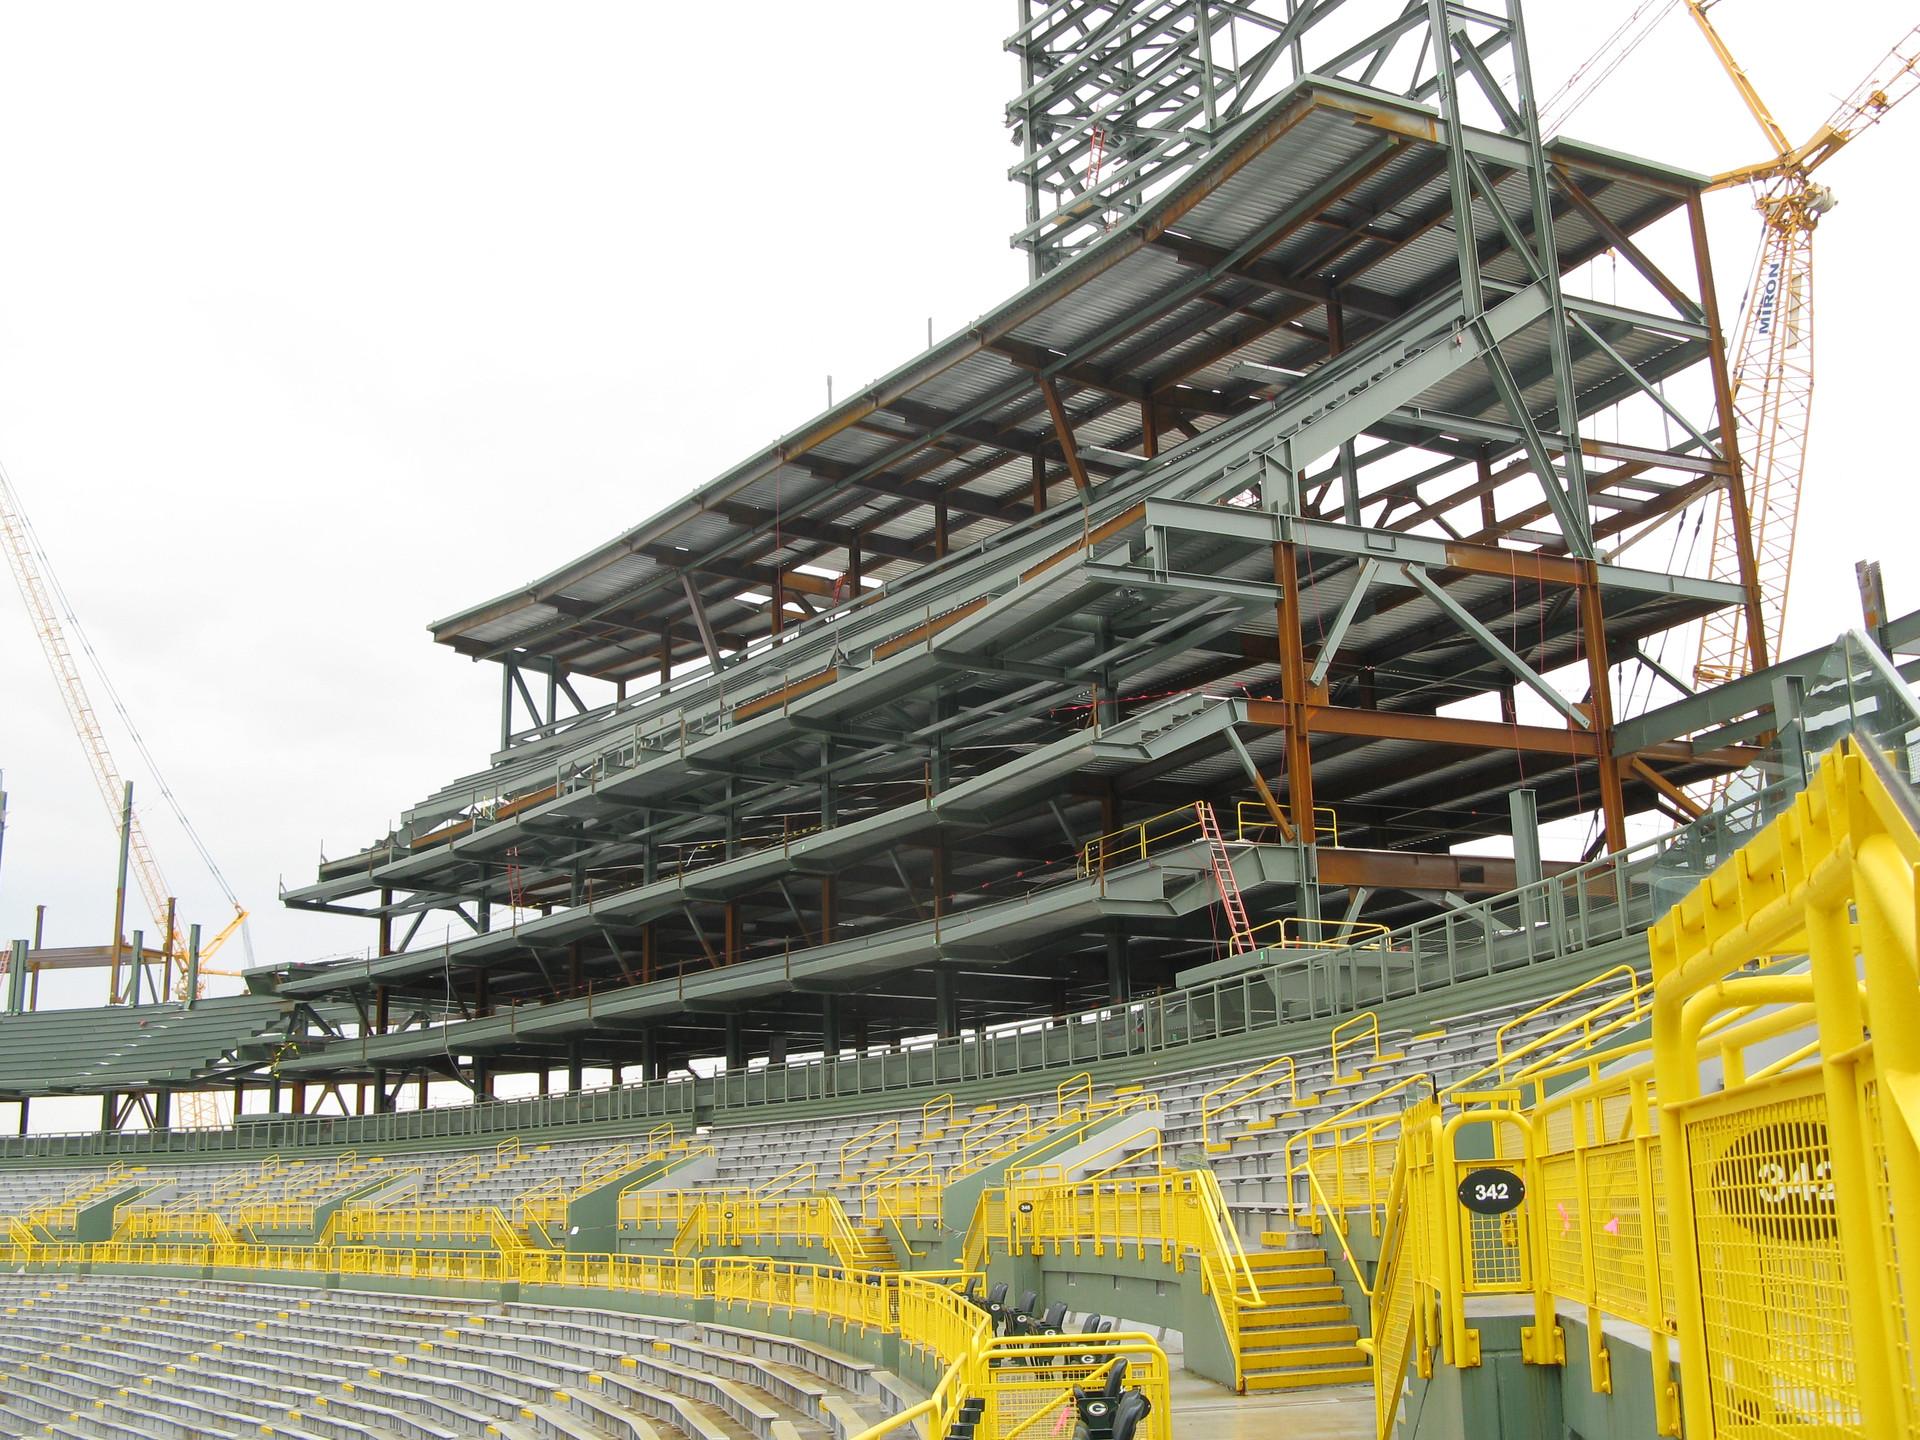 Lambeau Field Renovations (Green Bay, WI)